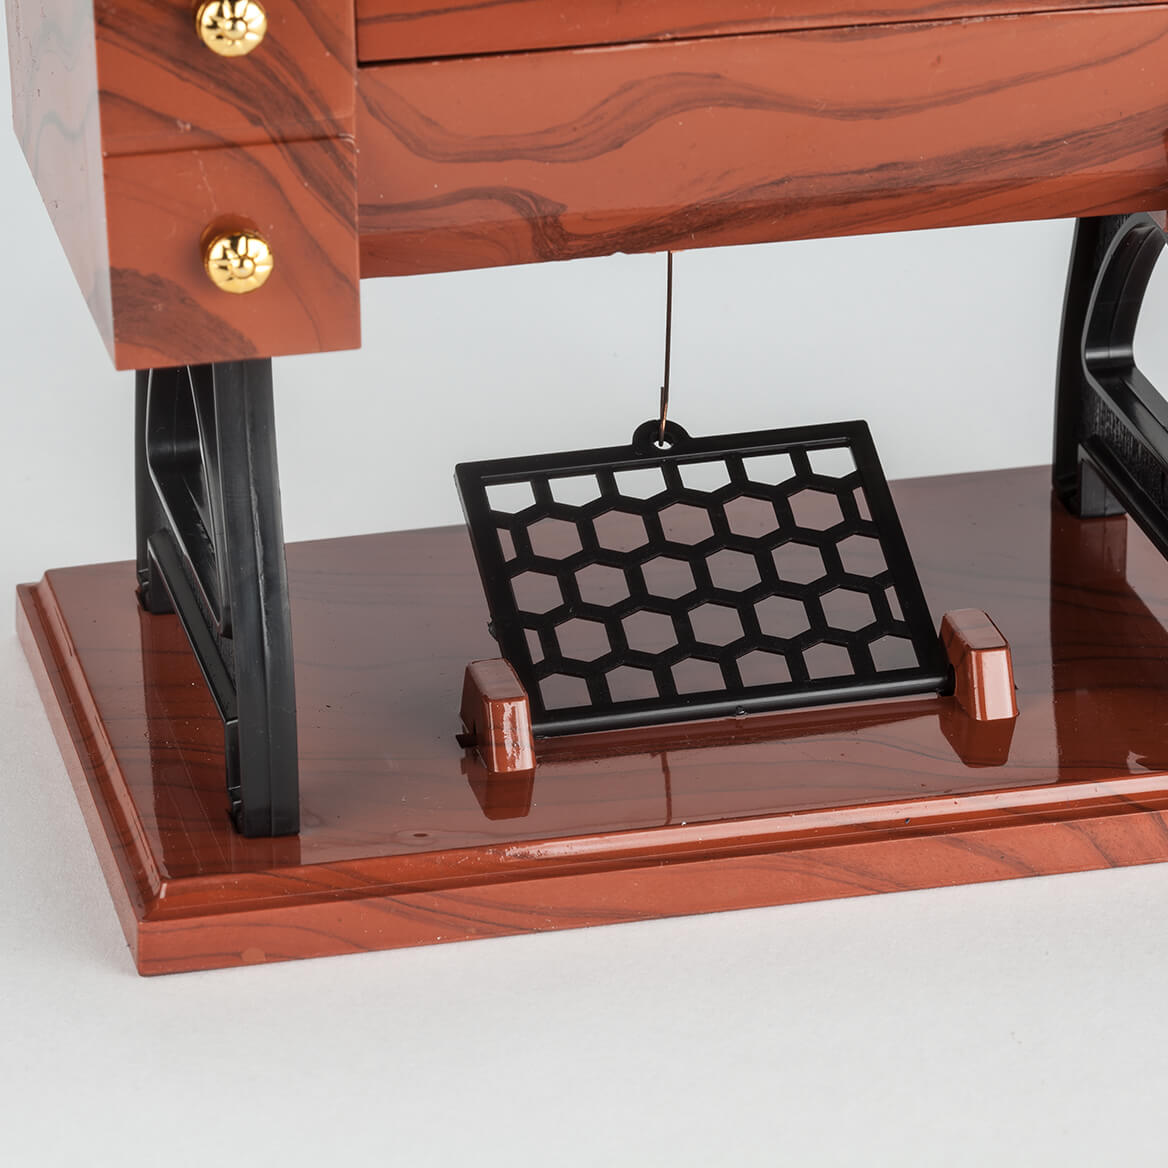 Vintage Sewing Machine Music Box-364682